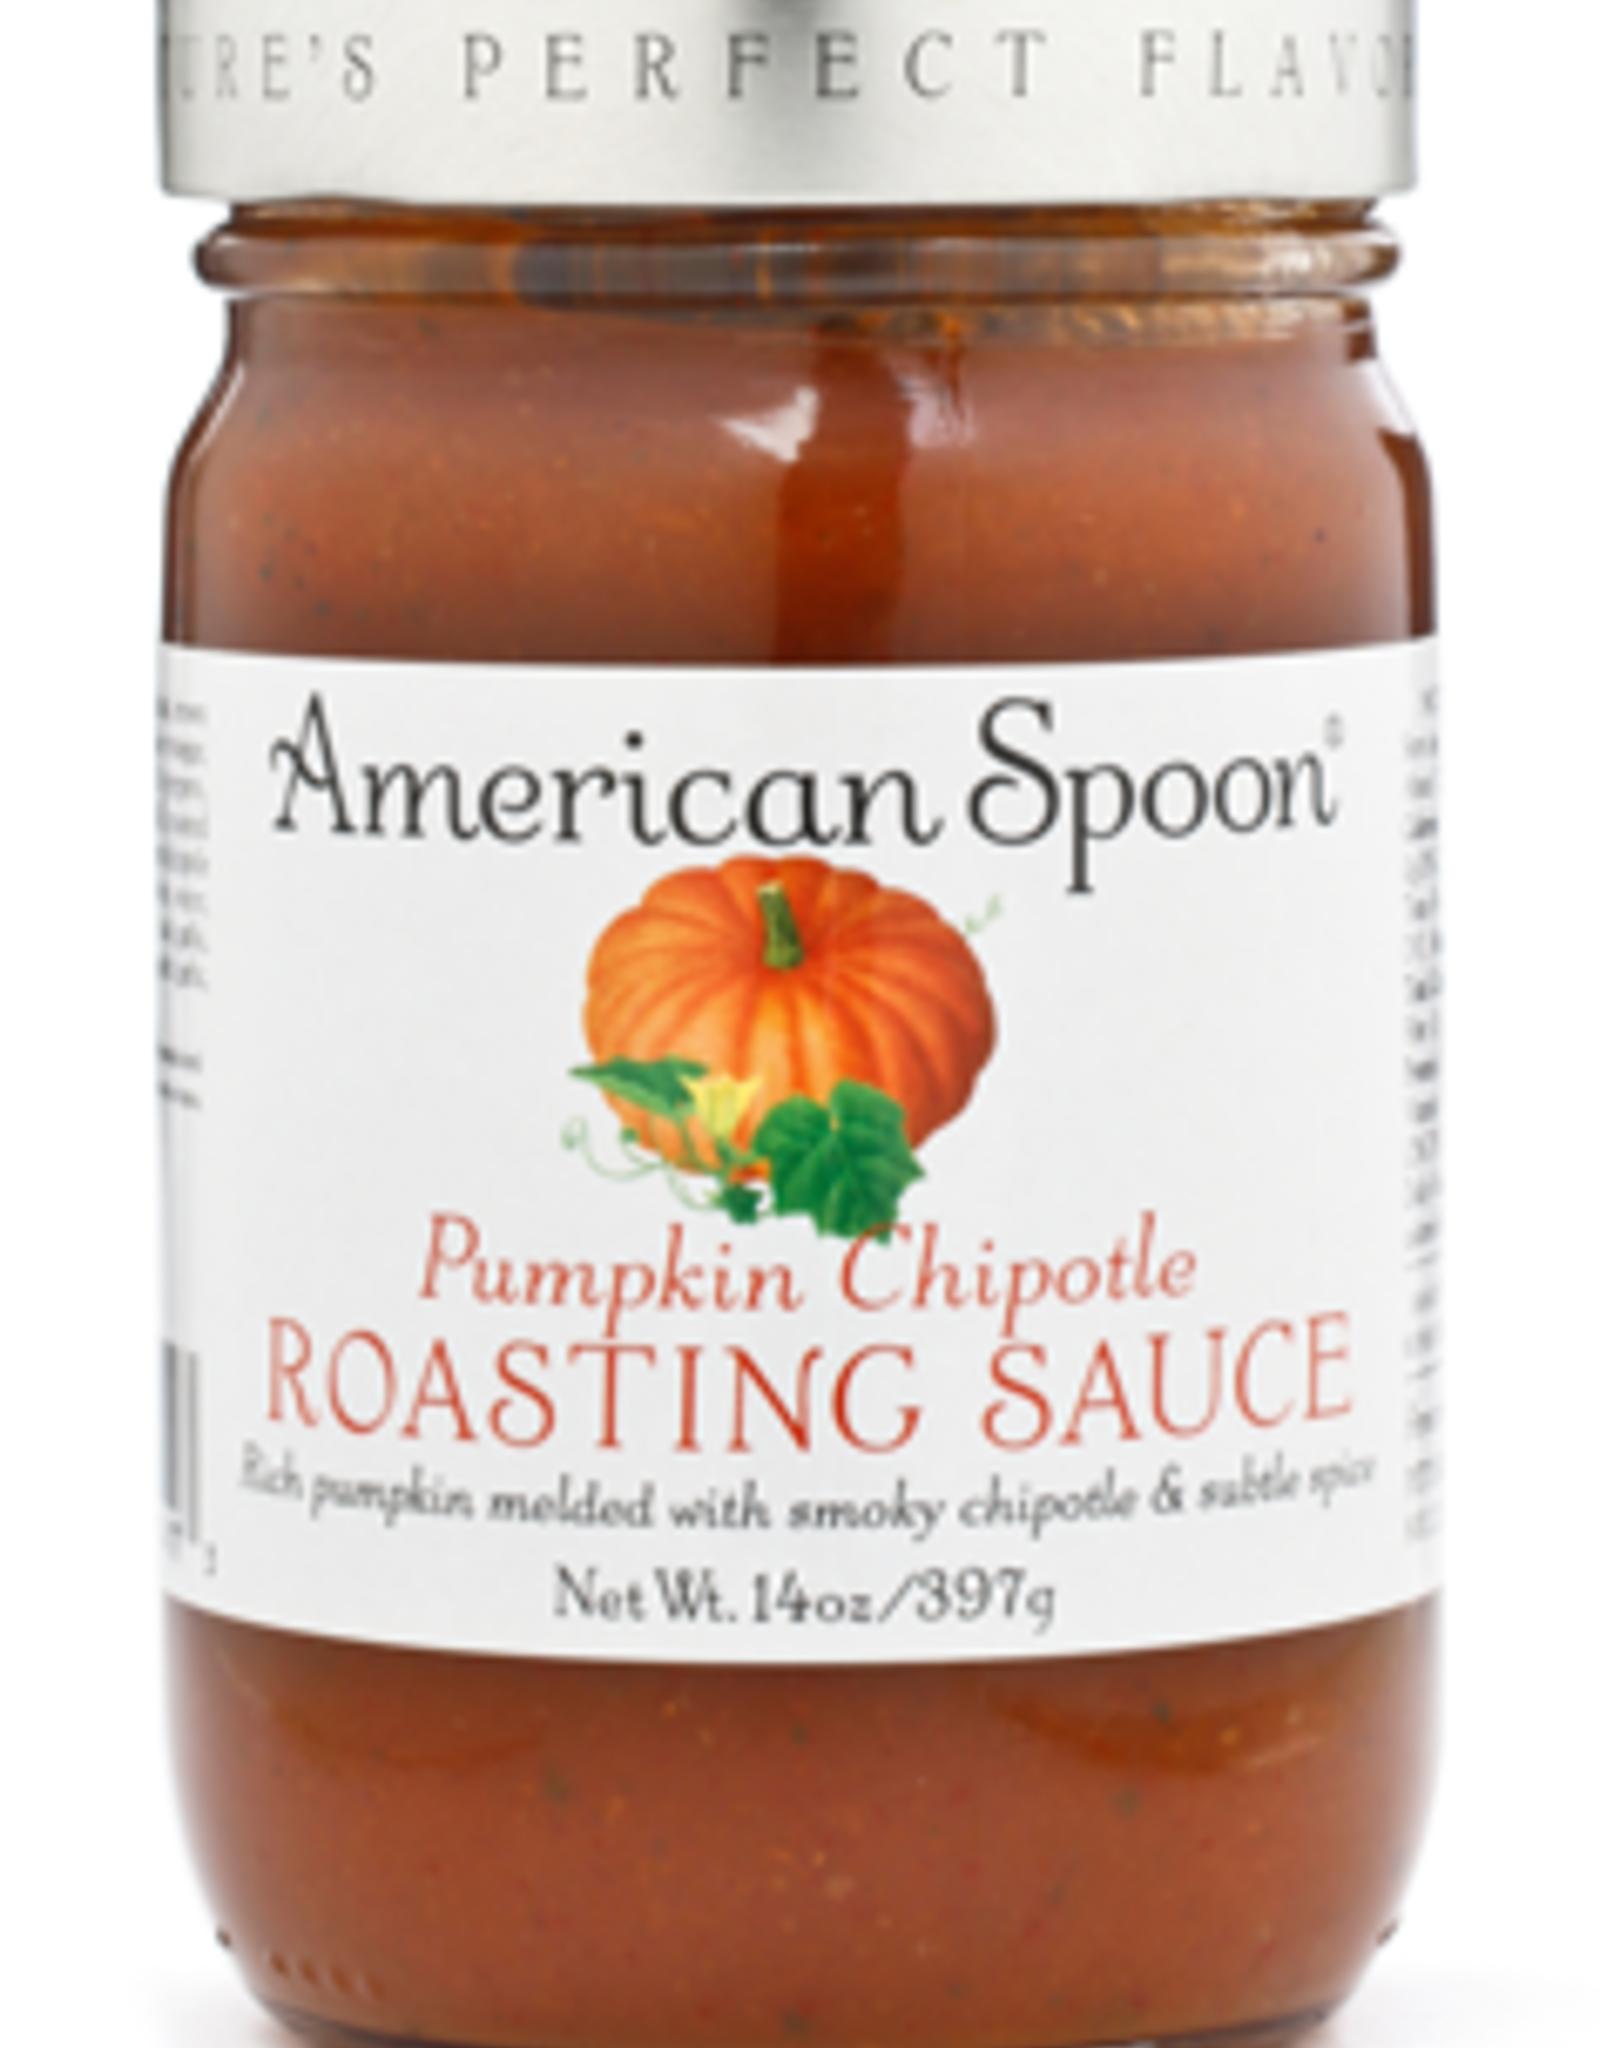 American Spoon AMERICAN SPOON PUMPKIN CHIPOTLE ROASTING SAUCE